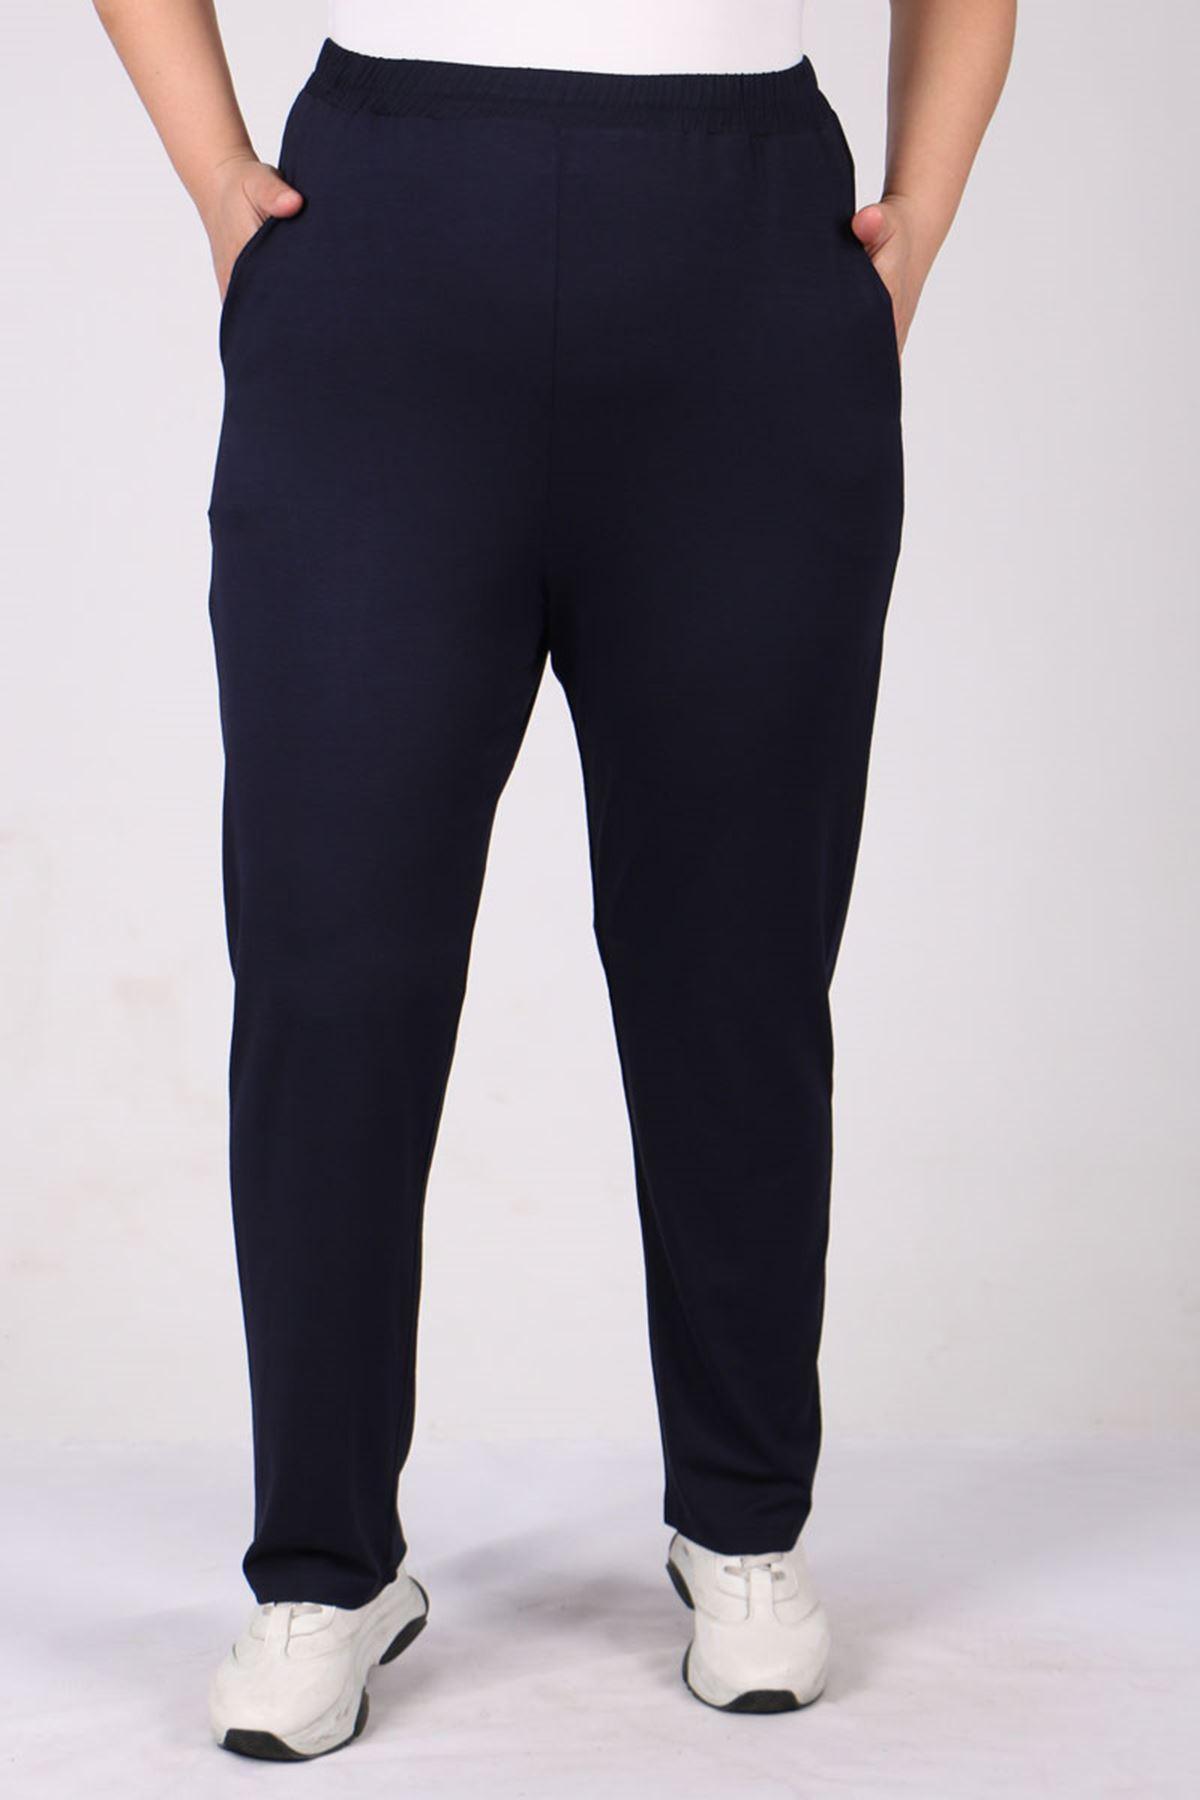 9160 Büyük Beden Penye Yüksek Bel Lastikli Pantolon - Lacivert